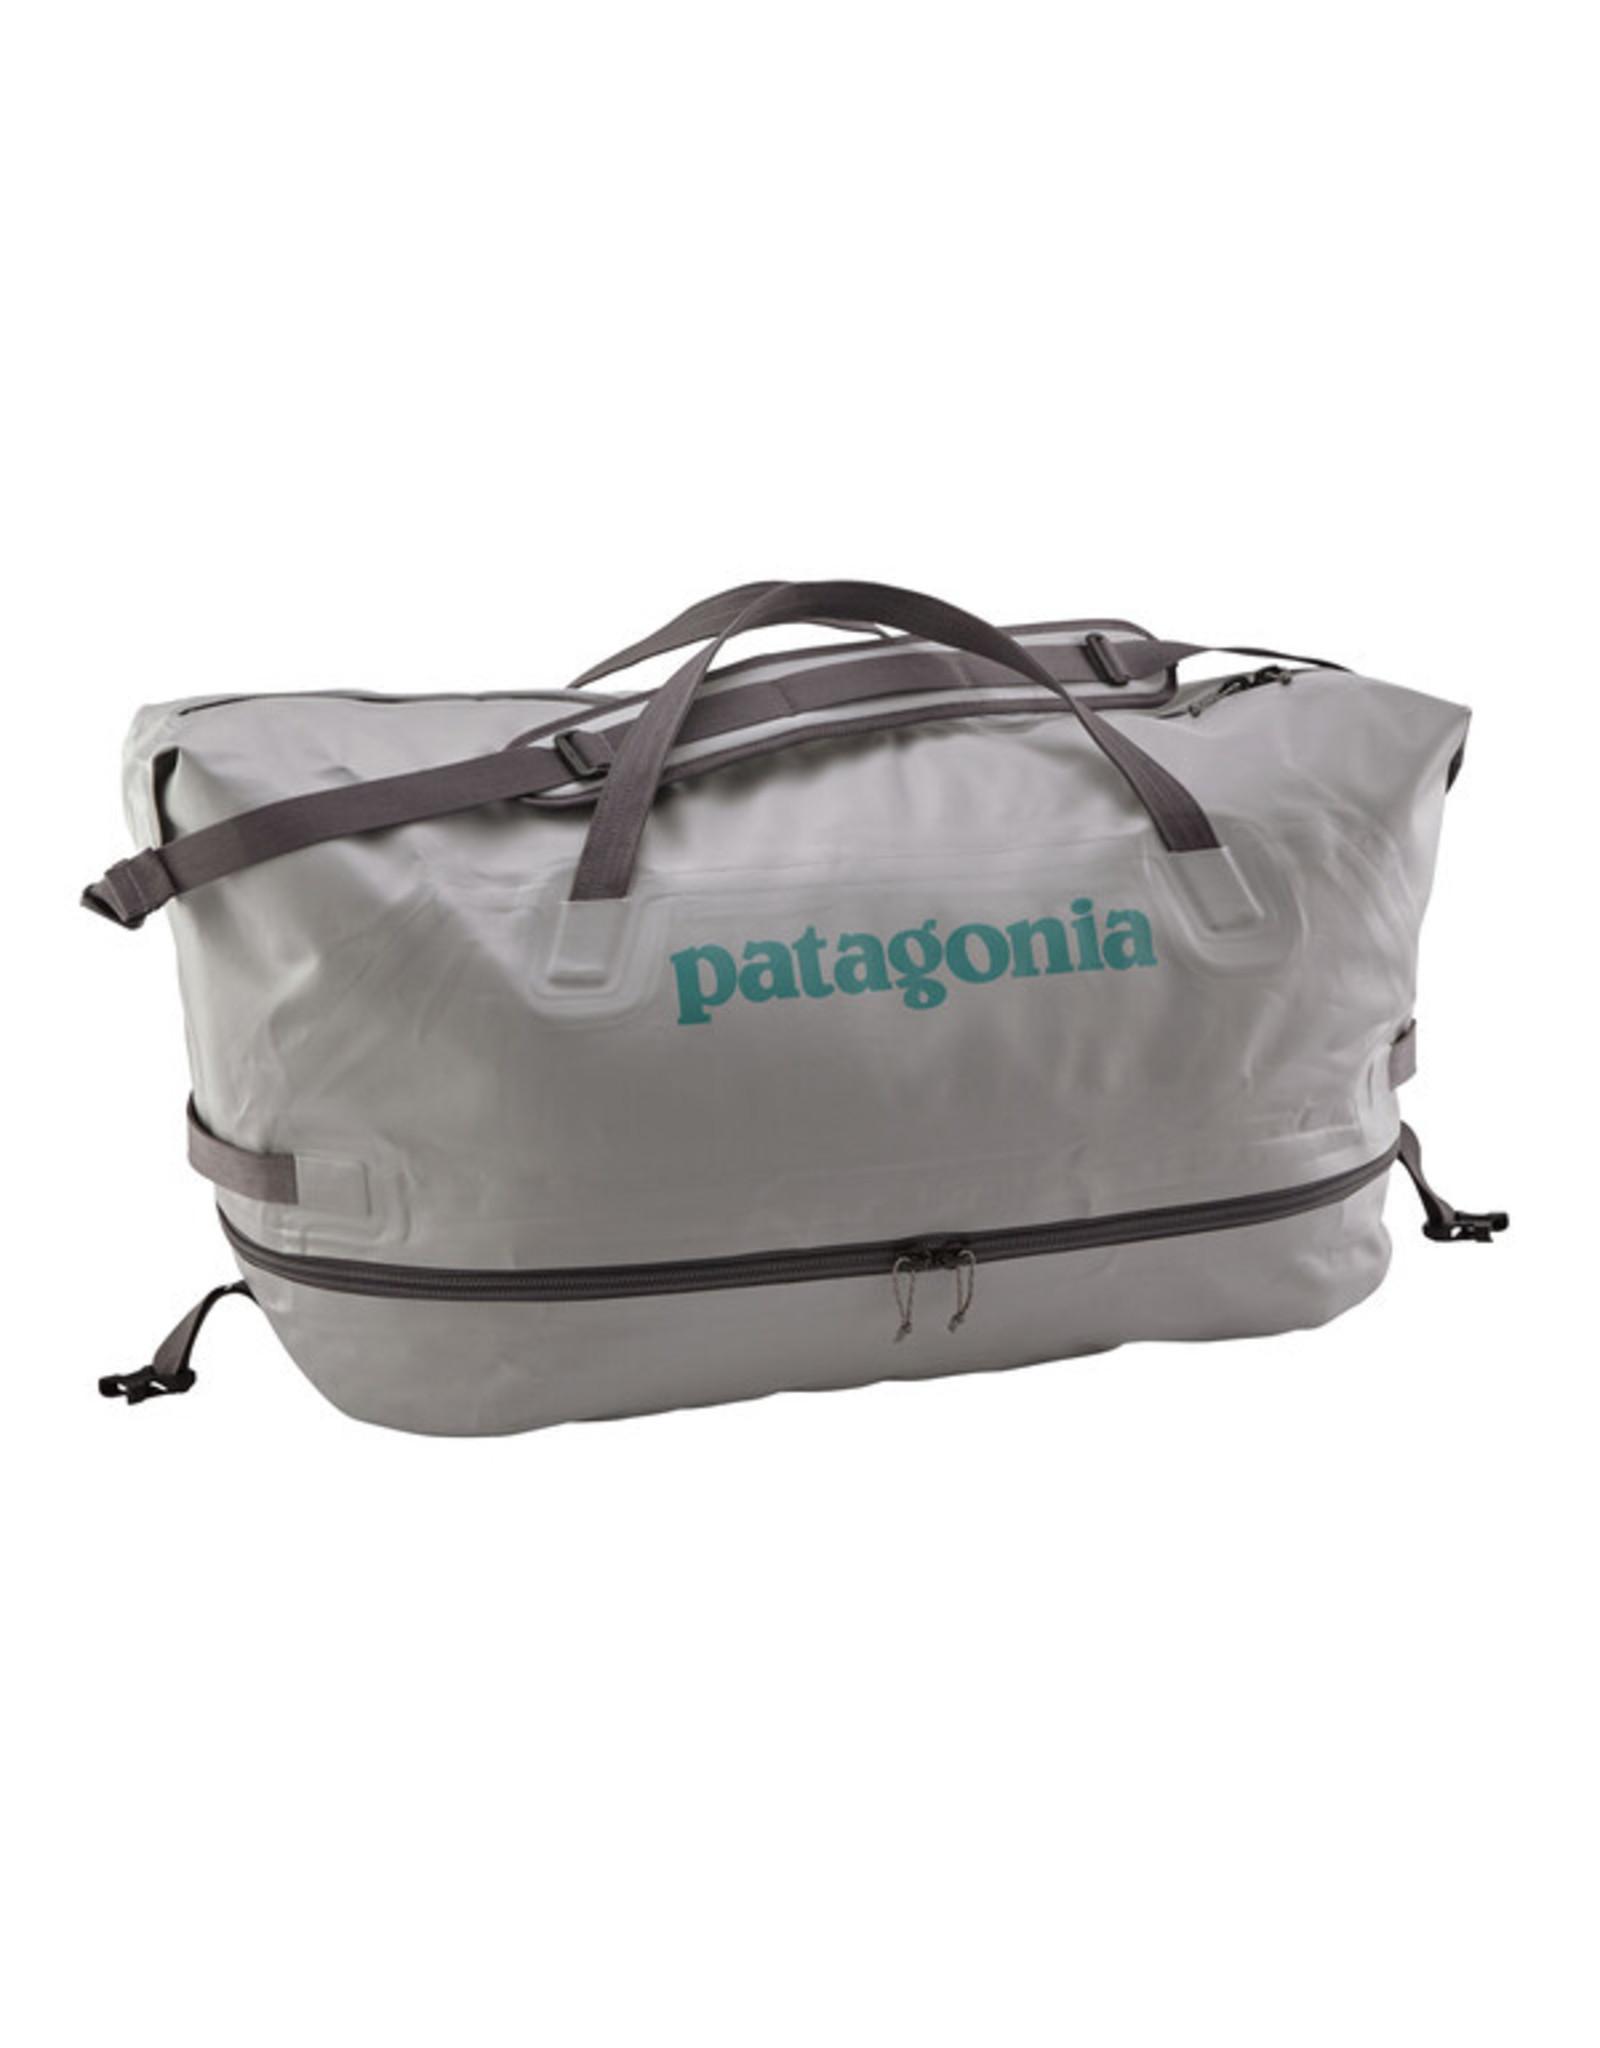 Patagonia Patagonia - Stormfront Wet/Dry Duffel